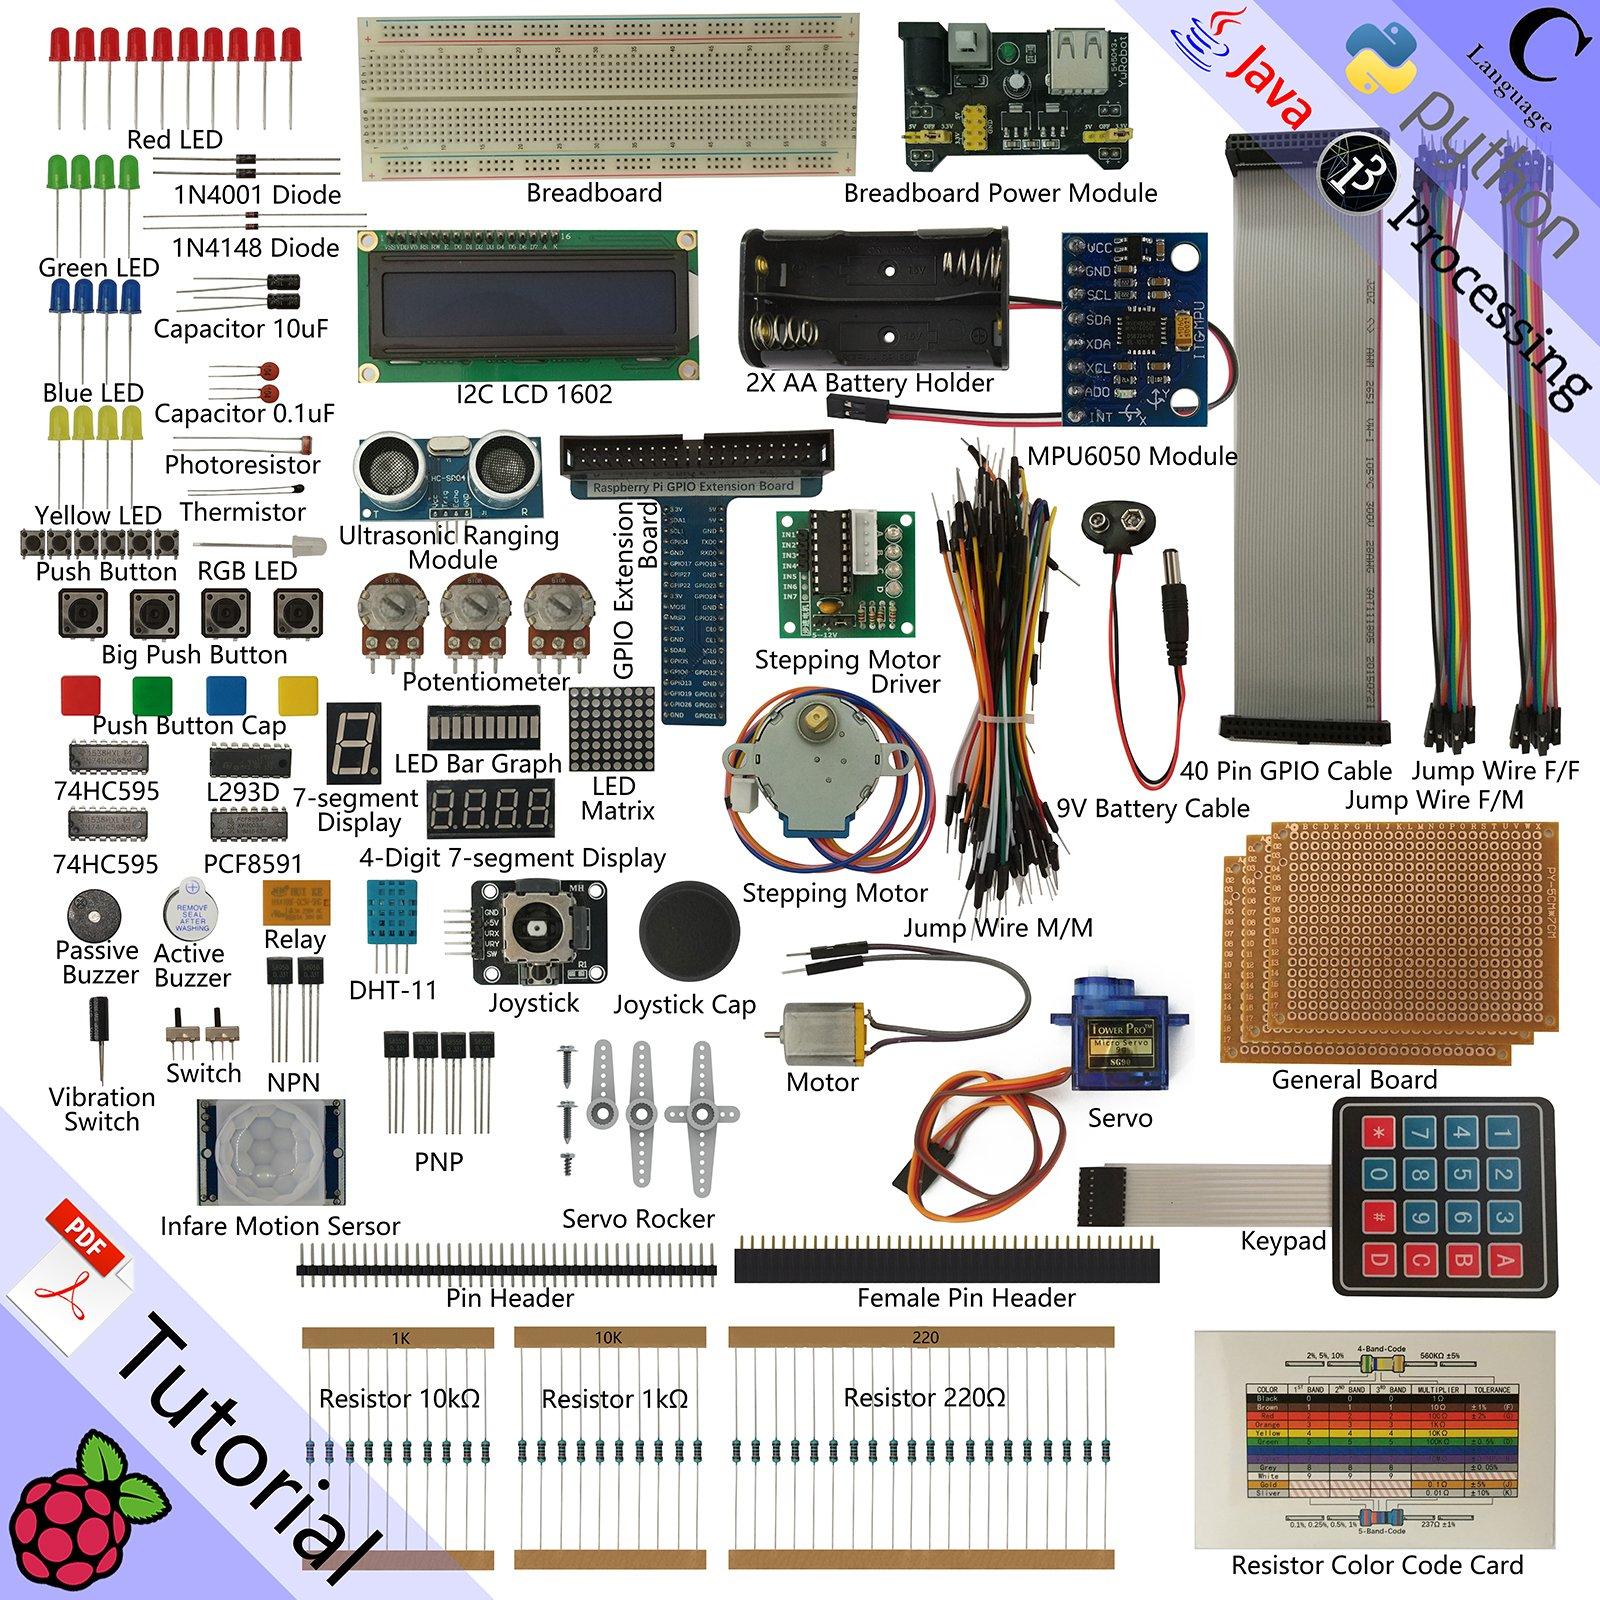 electronic project kits amazon co ukfreenove ultimate starter kit for raspberry pi, model 3b 3b 3a 2b 1b 1a zero